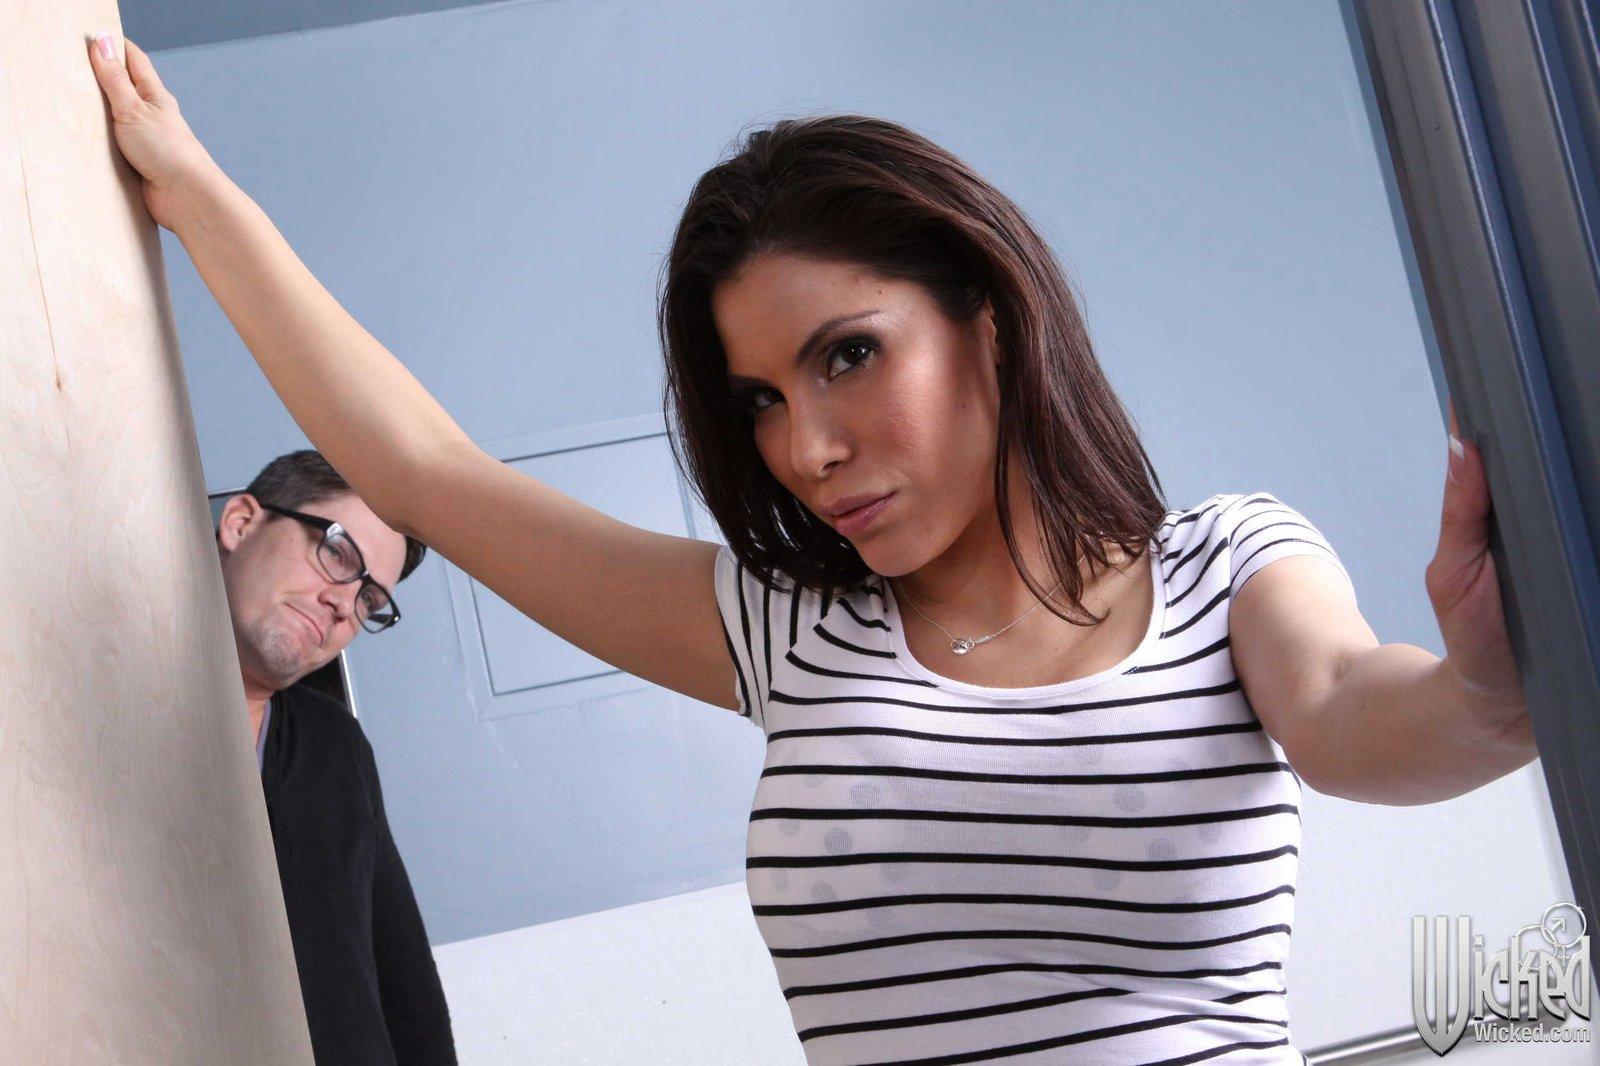 Latina ex-gf Aleksa Nicole fucks her former lover's big dick POV style № 1297357  скачать